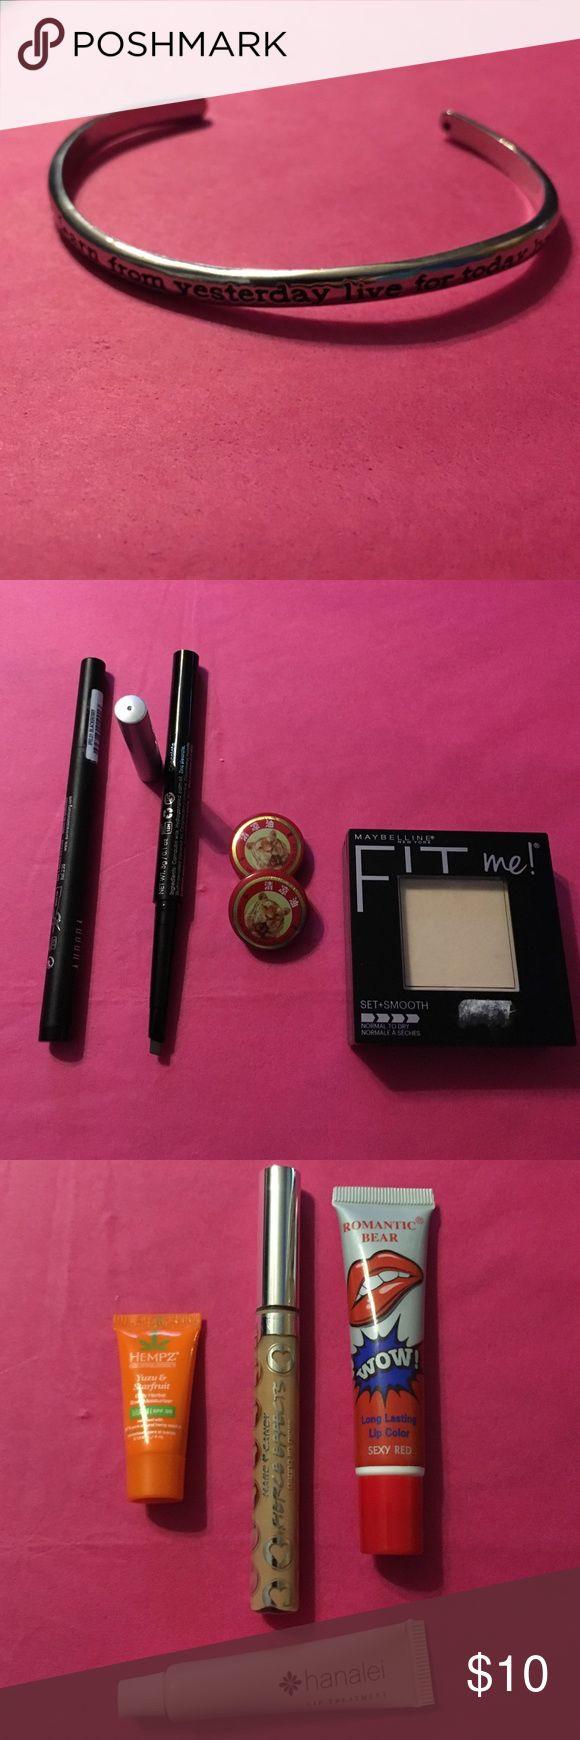 Makeup & Jewerly Bundle! �� Hanalei Lip Treatment Hempz Yuzu & Starfruit  Lotion Tester